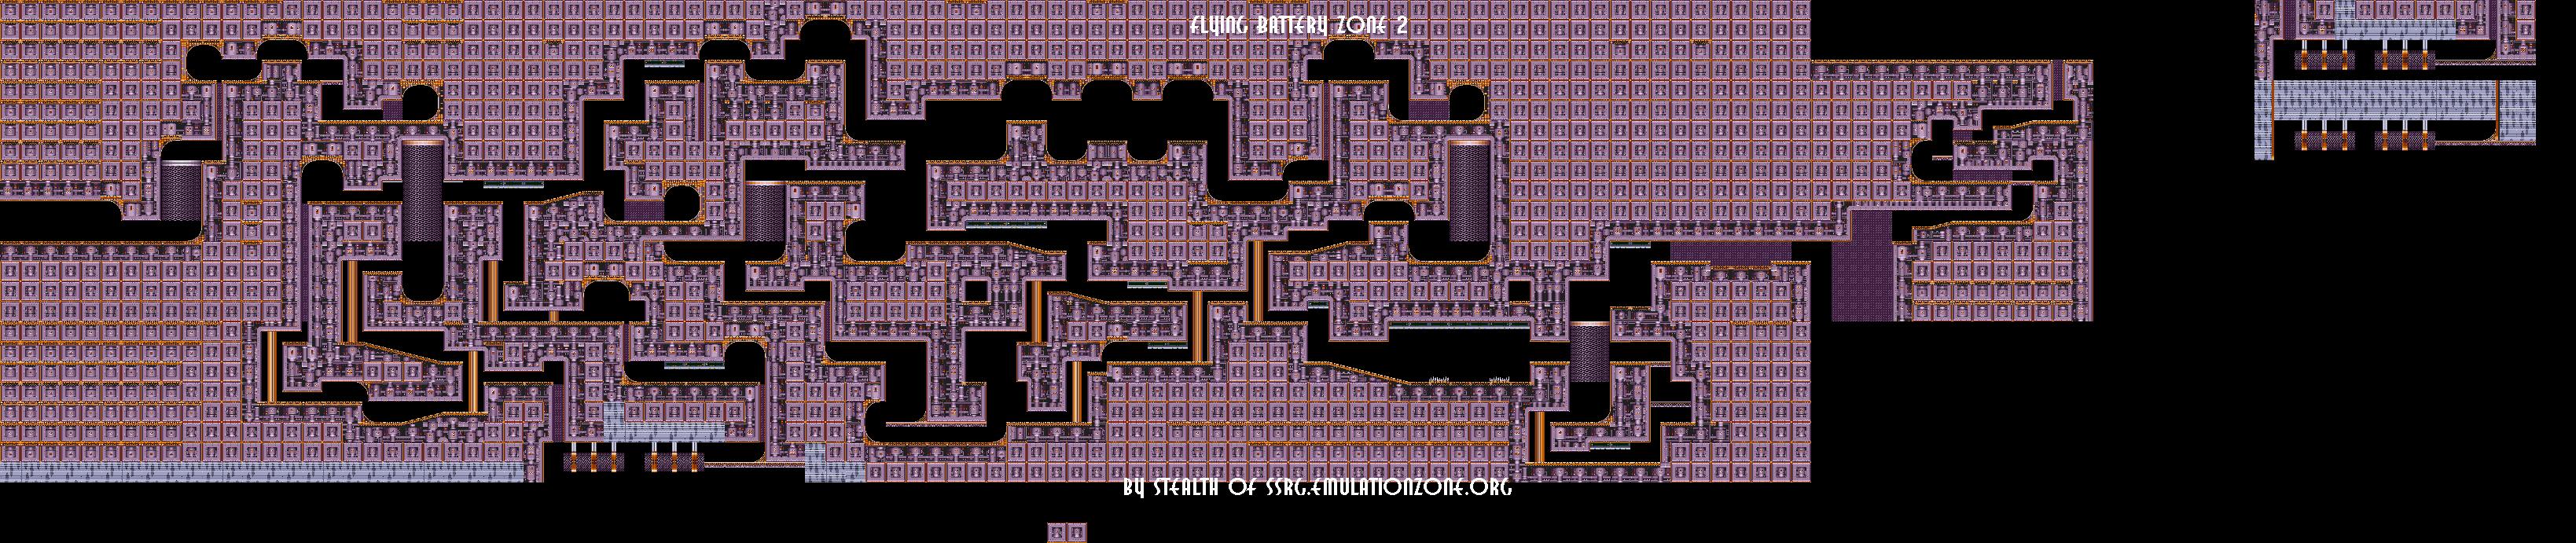 Level Maps For Sonic 2 3 Amp K Things Of Interest